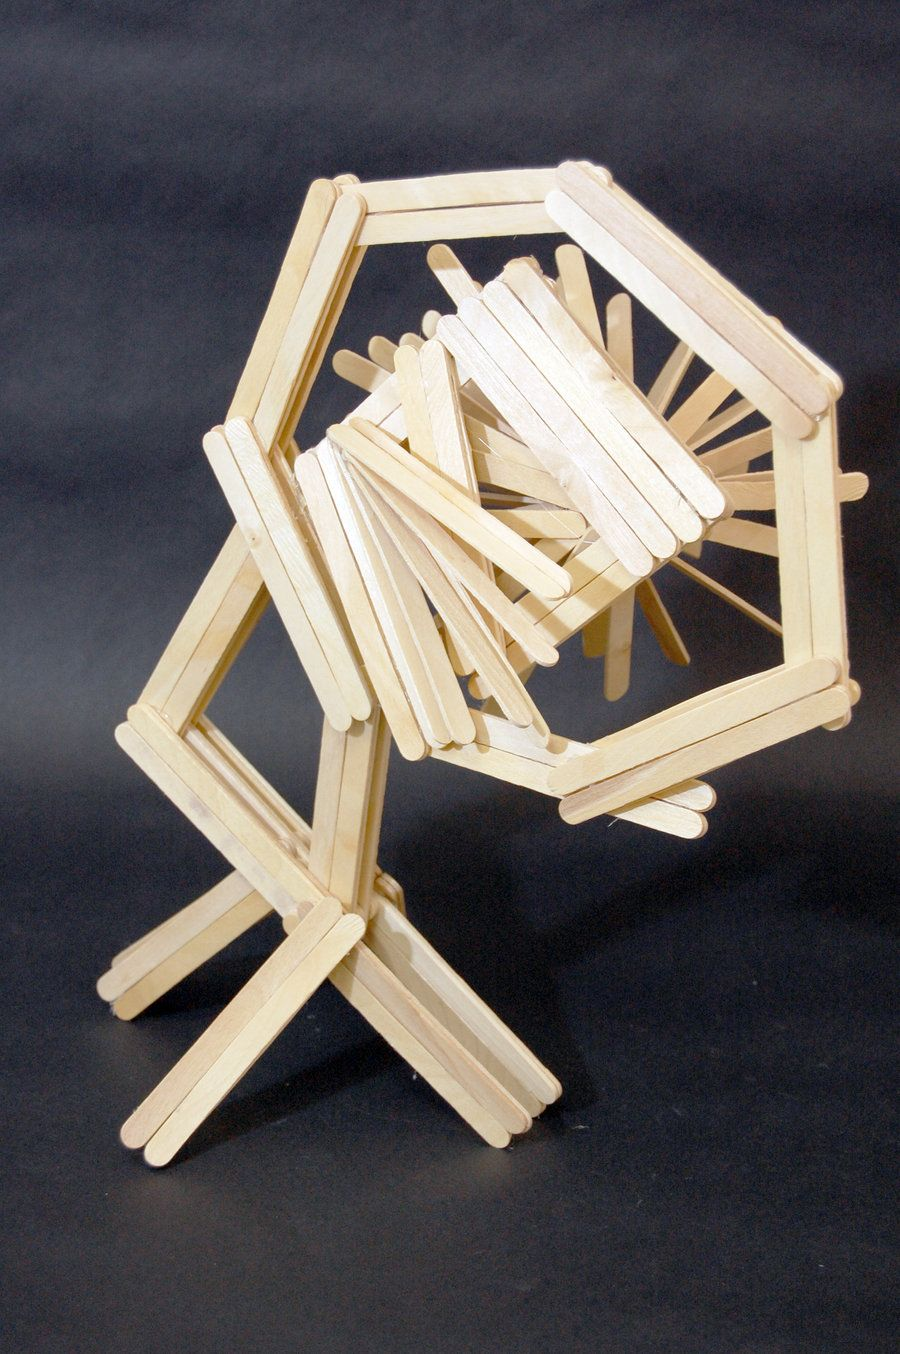 craft ideas with popsicle sticks molding sculpting. Black Bedroom Furniture Sets. Home Design Ideas